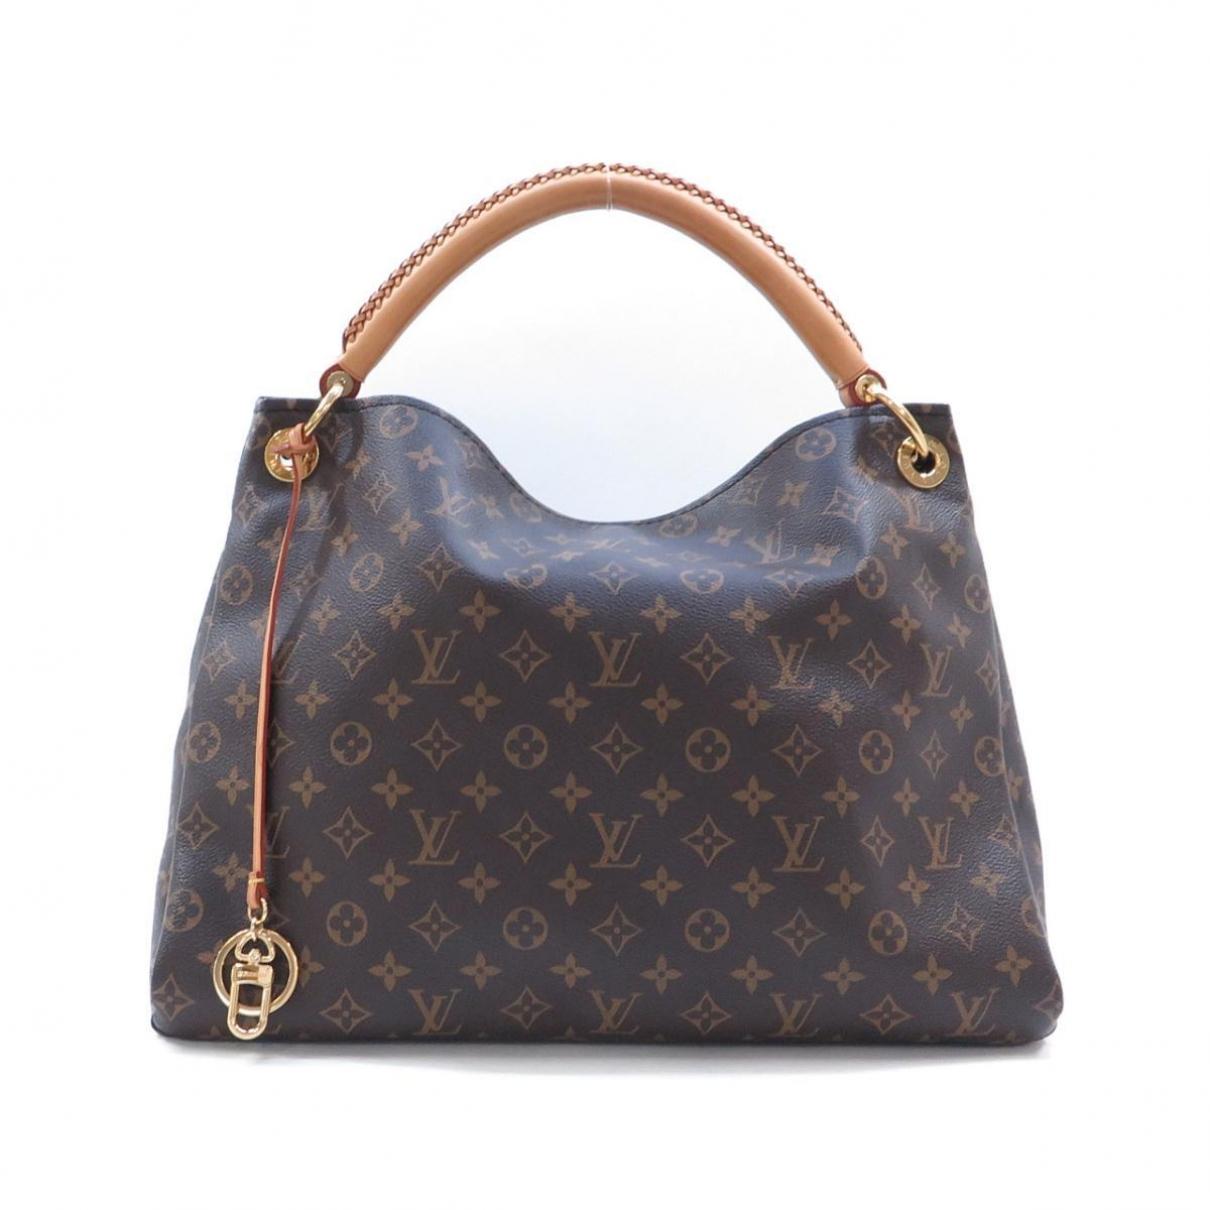 Louis Vuitton Artsy Brown Cloth handbag for Women \N